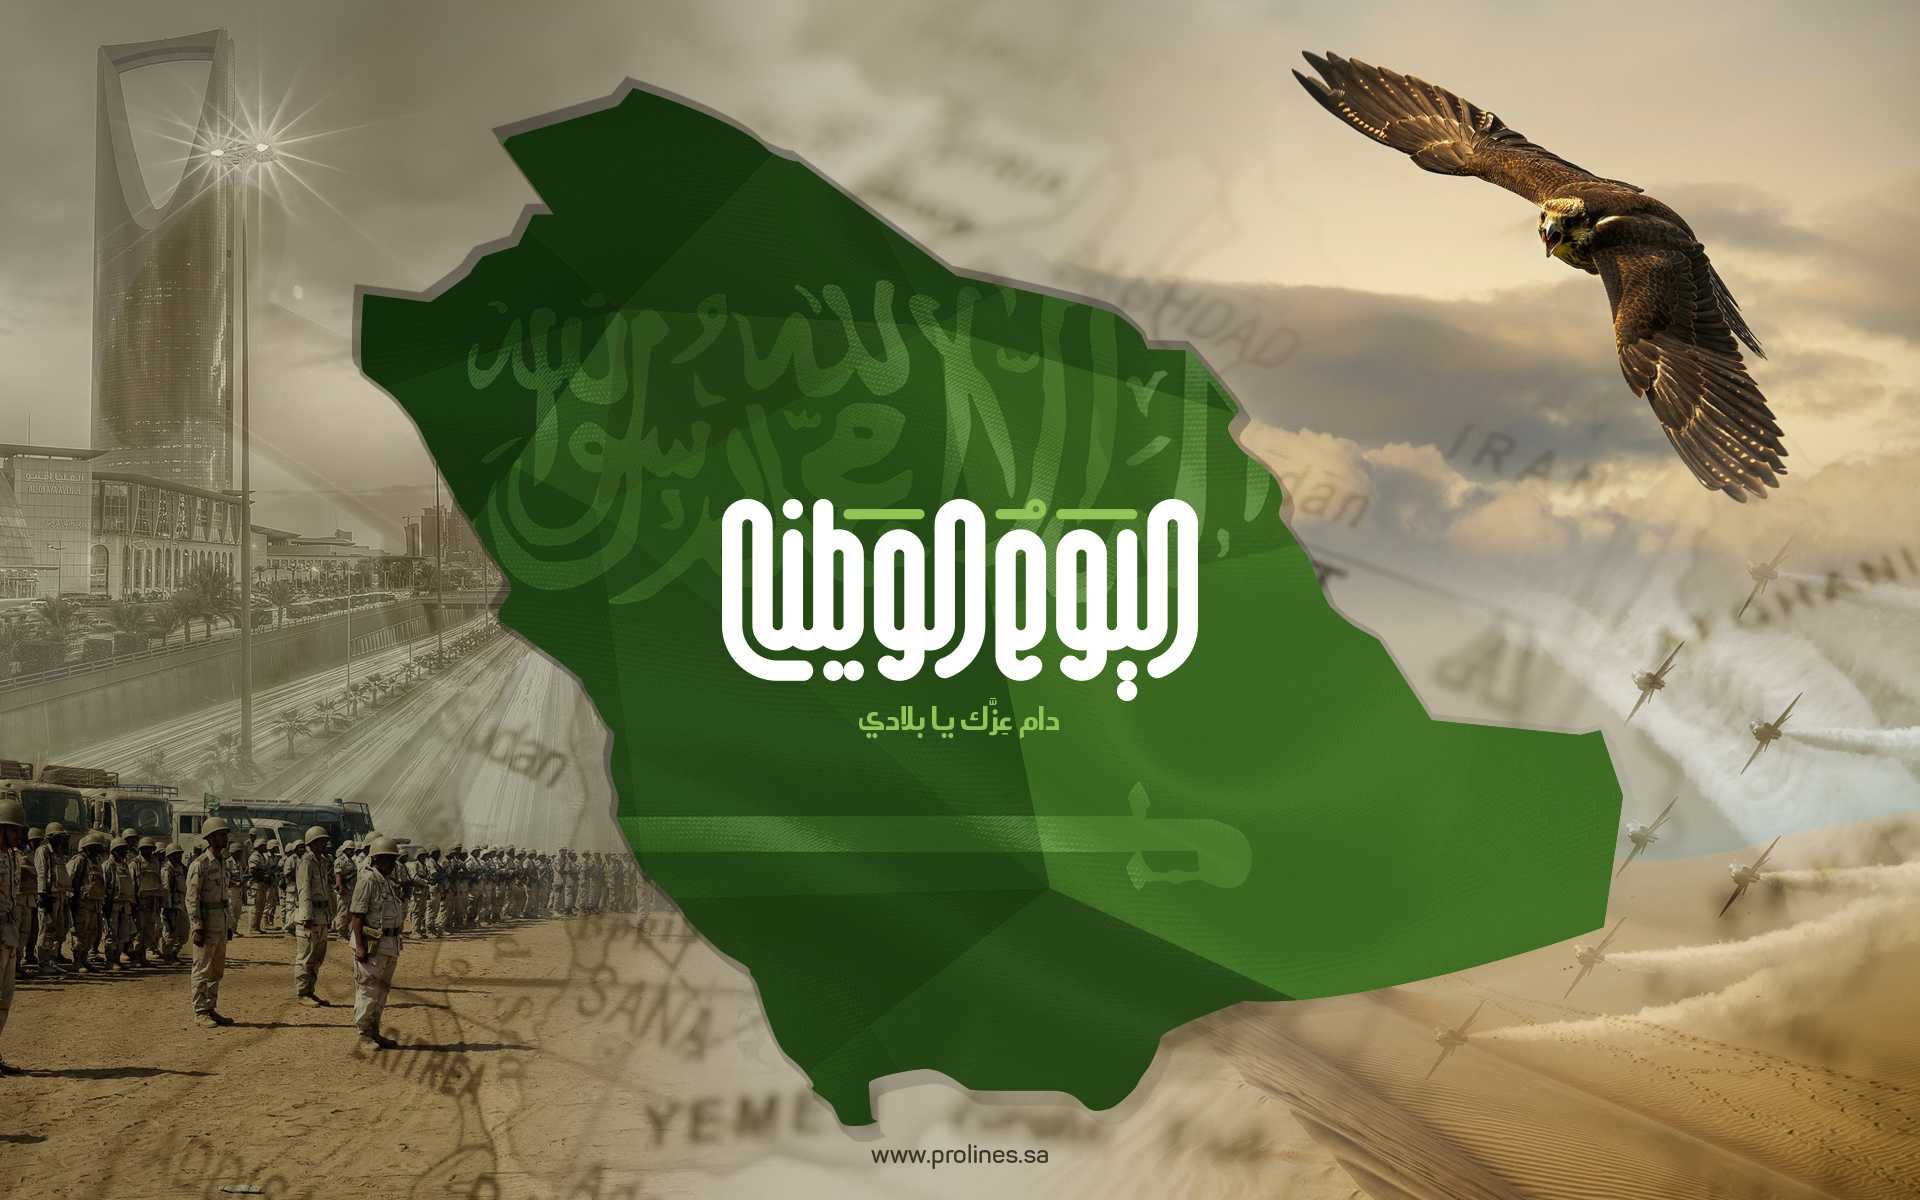 Saudi National Day 2017 Wallpapers  Prolines